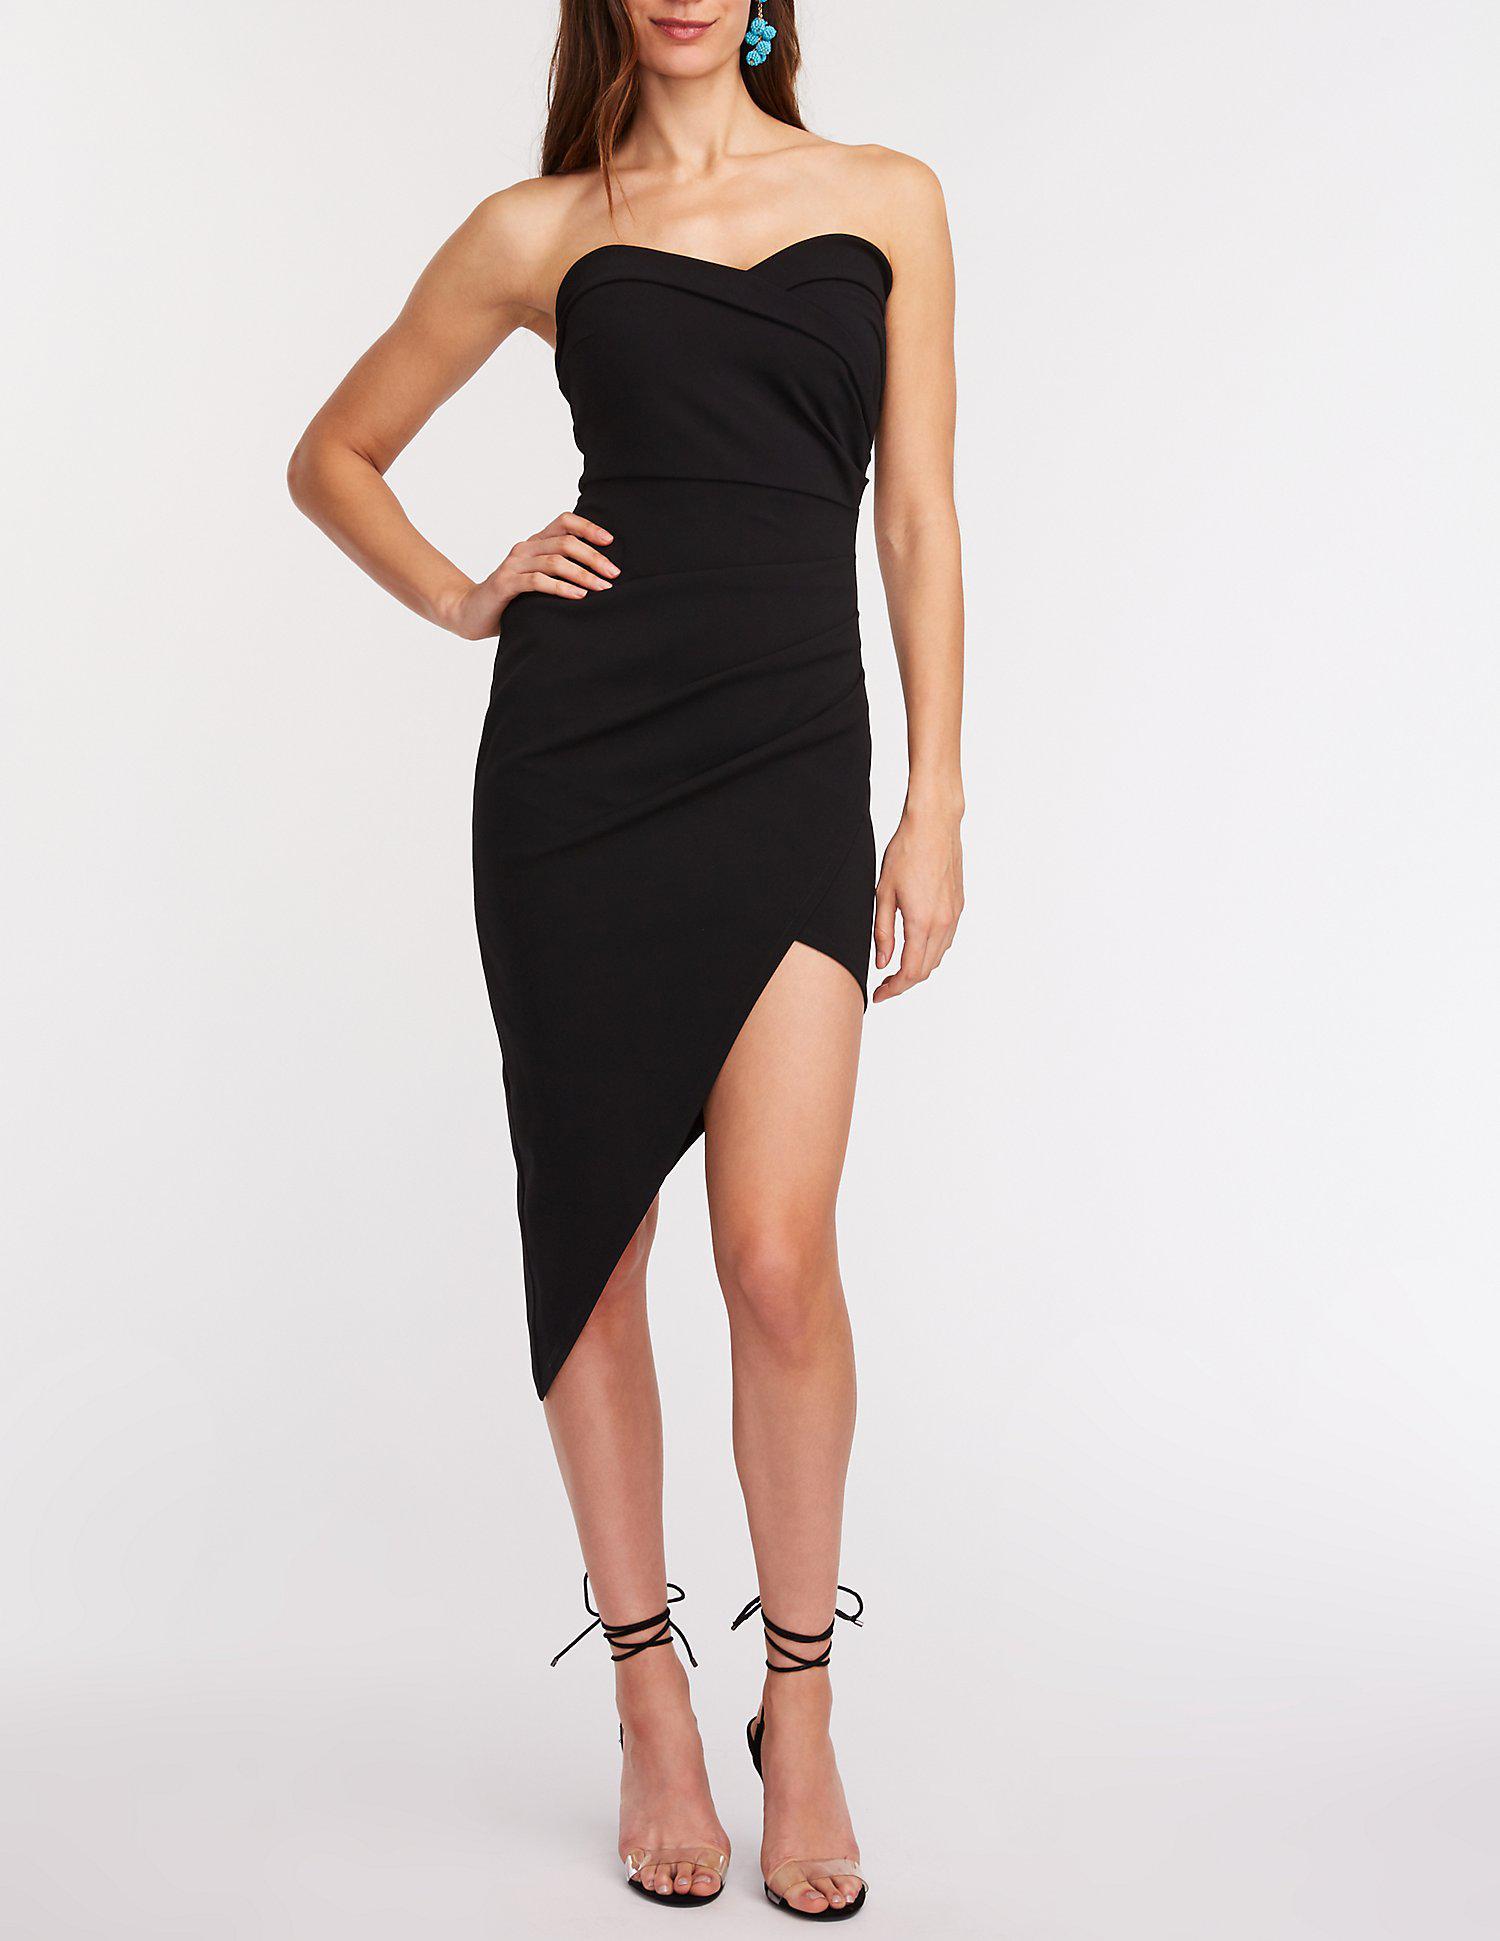 875e7ca9c0f Lyst - Charlotte Russe Strapless Asymmetrical Bodycon Dress in Black